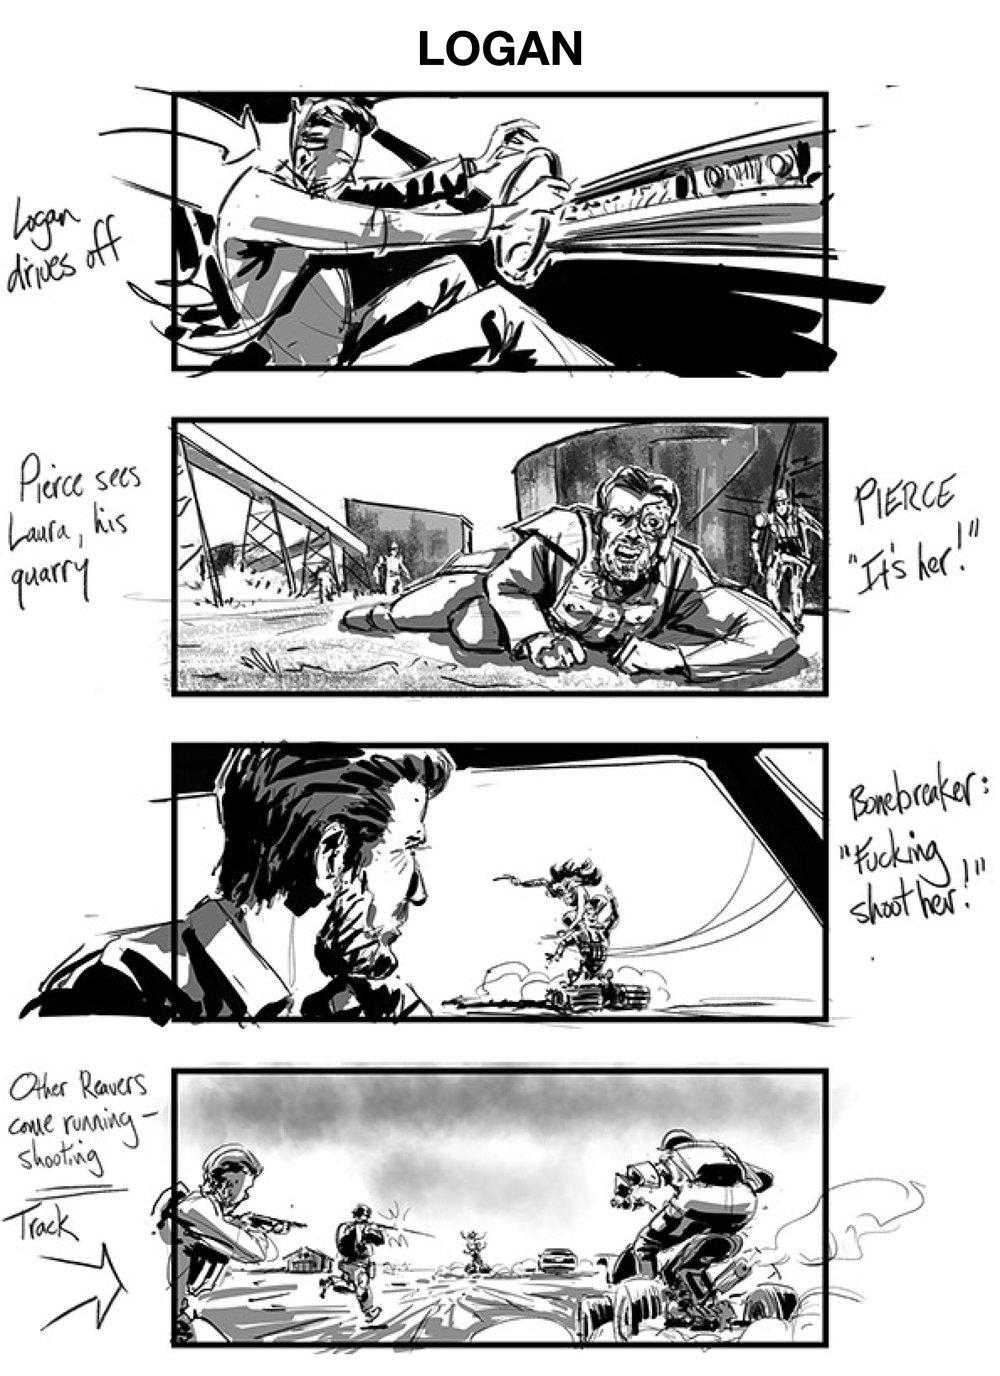 Logan web-02.jpg